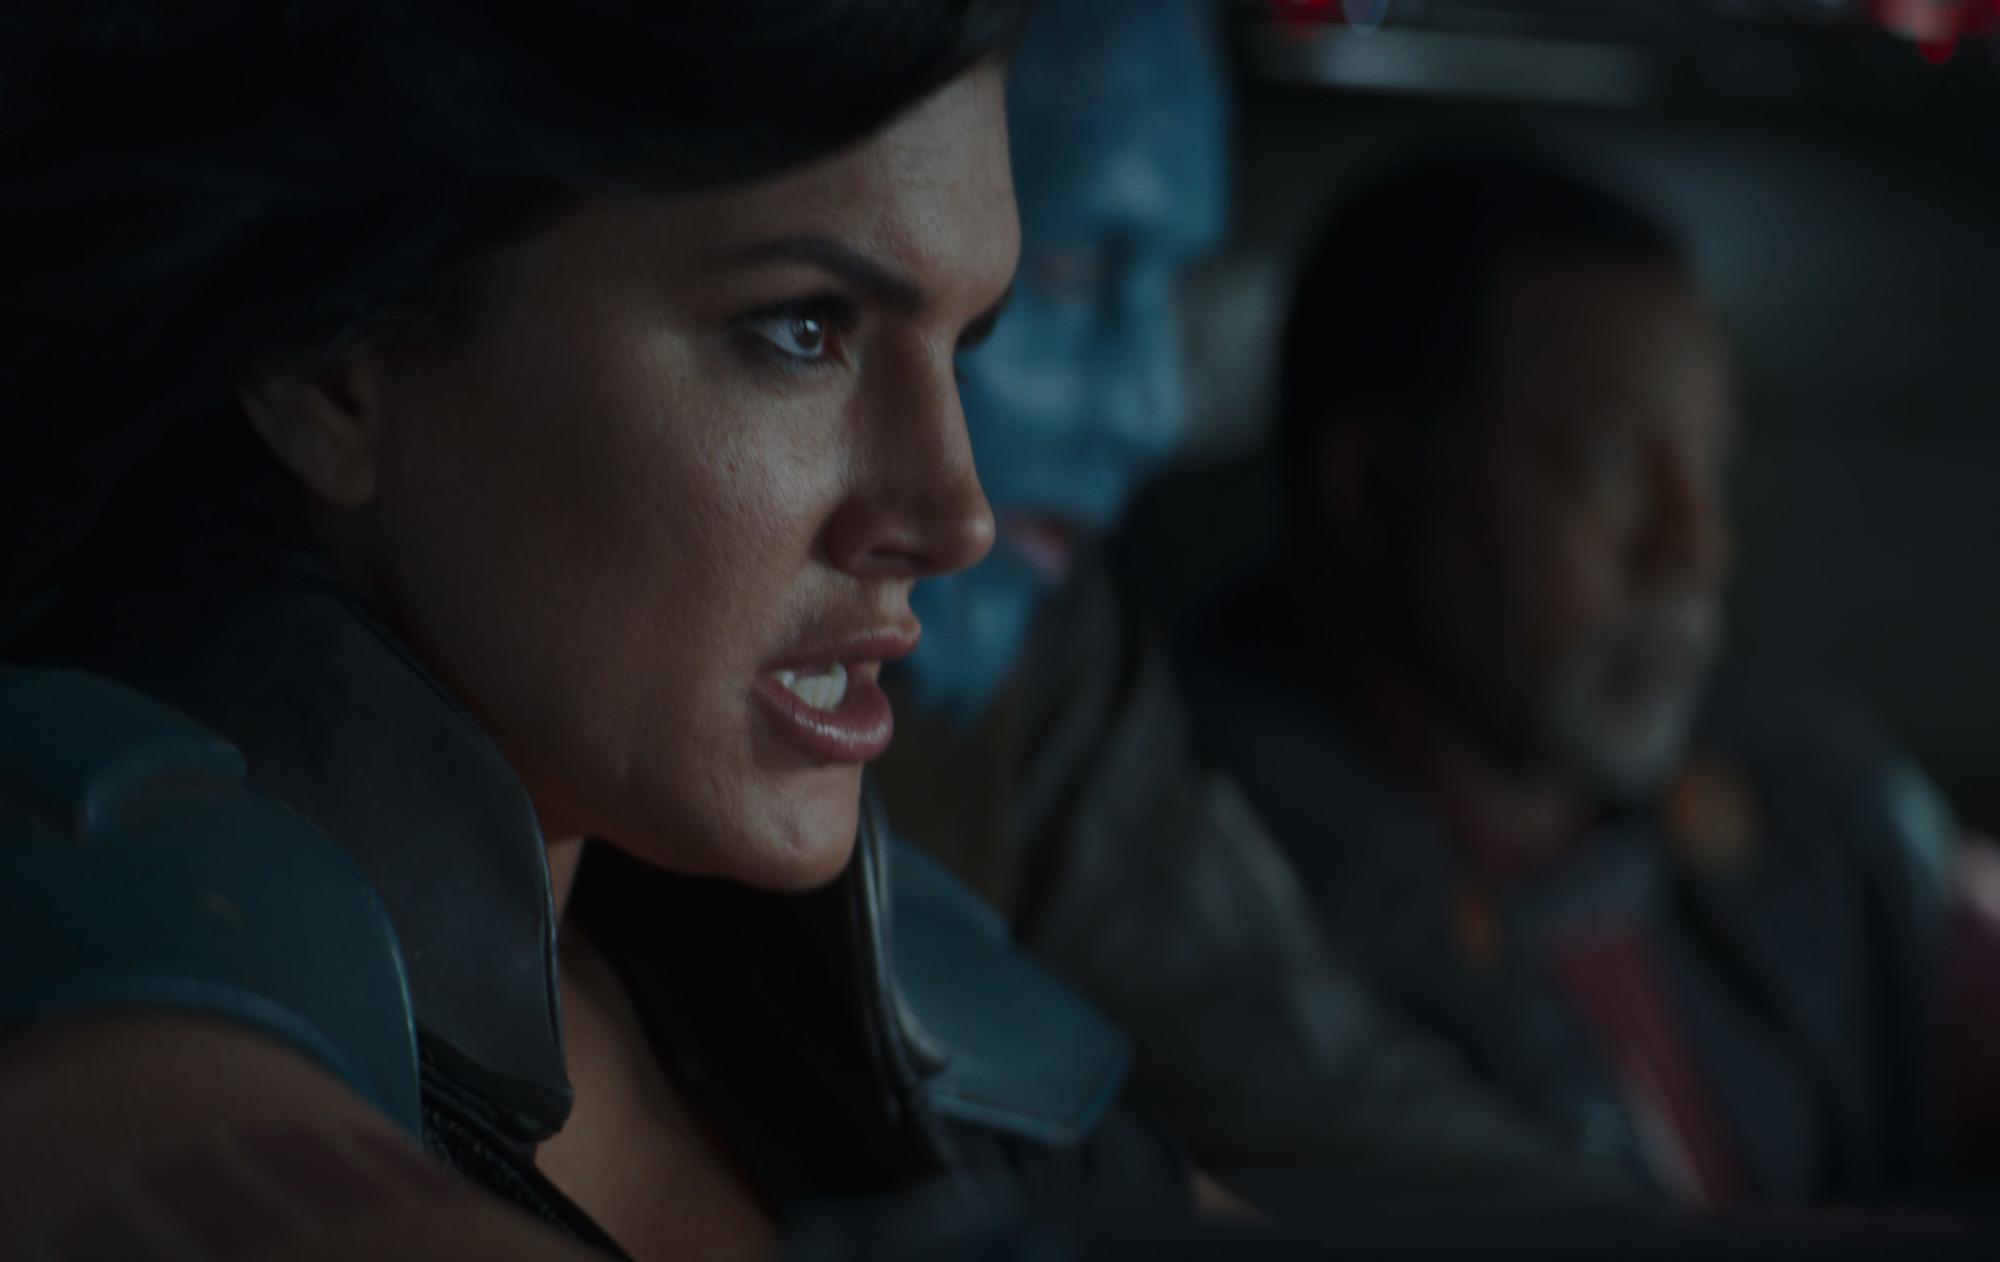 Gina Carano as Cara Dune and Carl Weathers as Greef Karga in Season 2 of 'The Mandalorian'